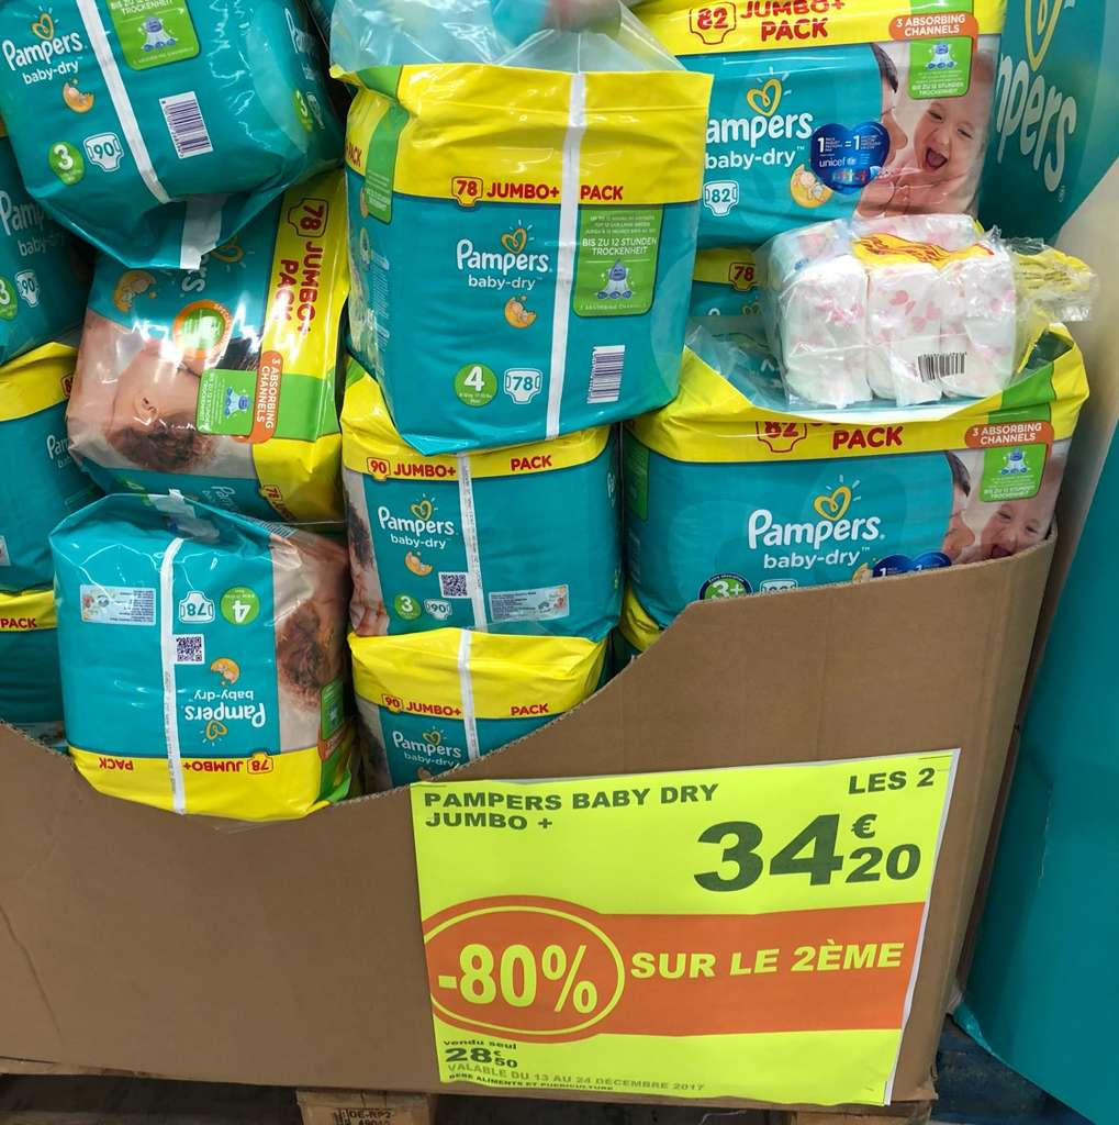 2 paquets de couches pampers baby dry jumbo diff rentes - Combien coute un paquet de couche pampers ...